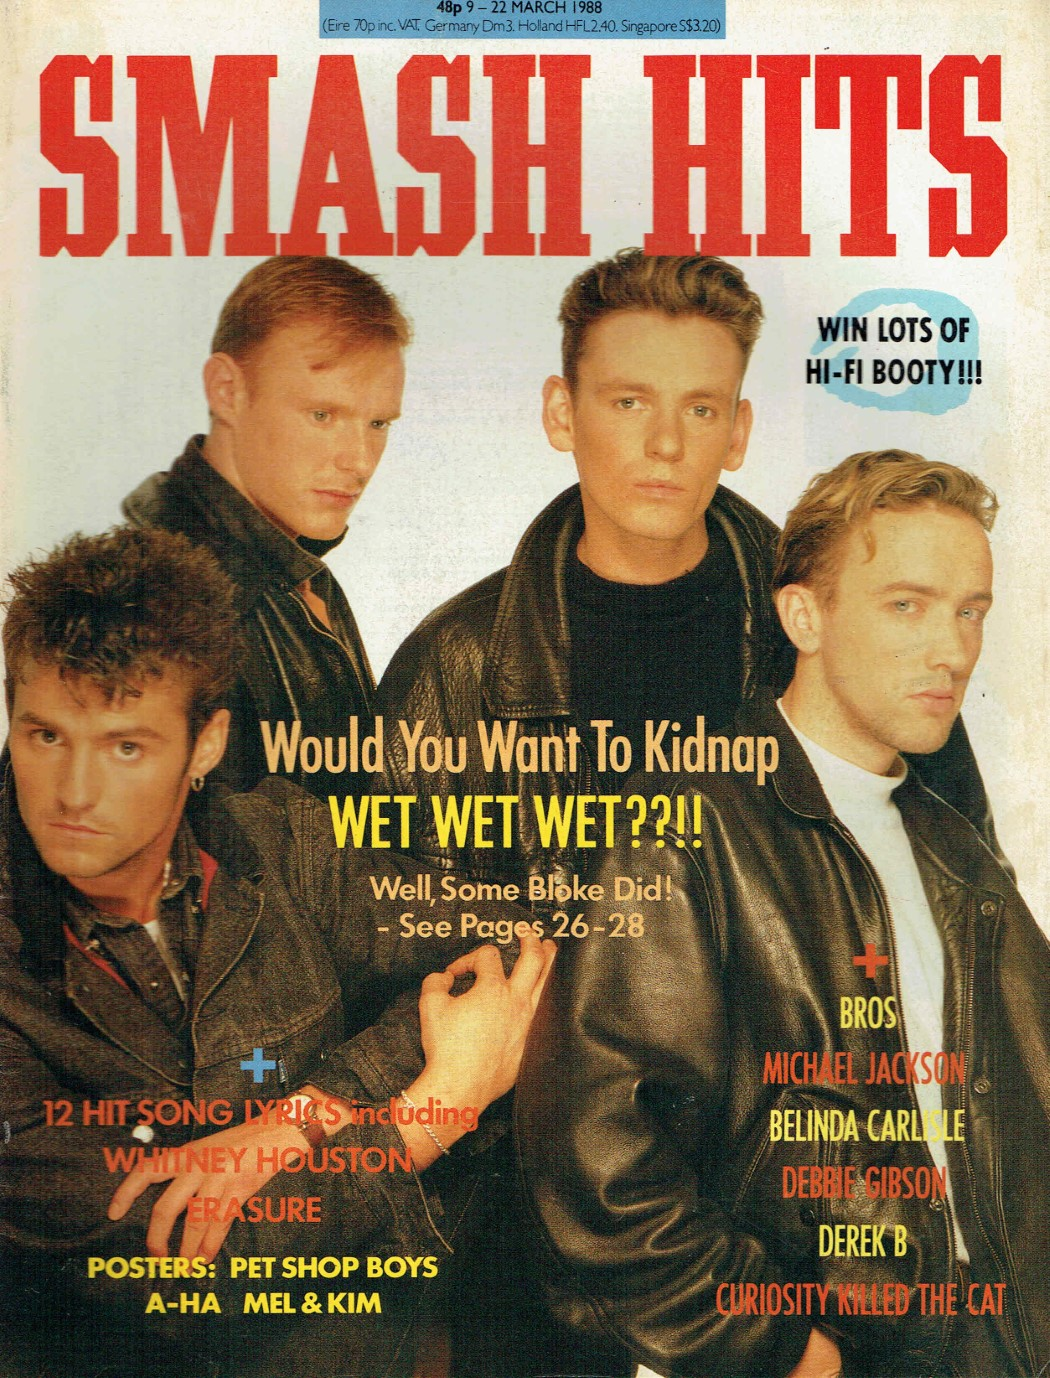 SMASH HITS UK MAGAZINE 9TH - 22ND MARCH 1988 WET WET WET